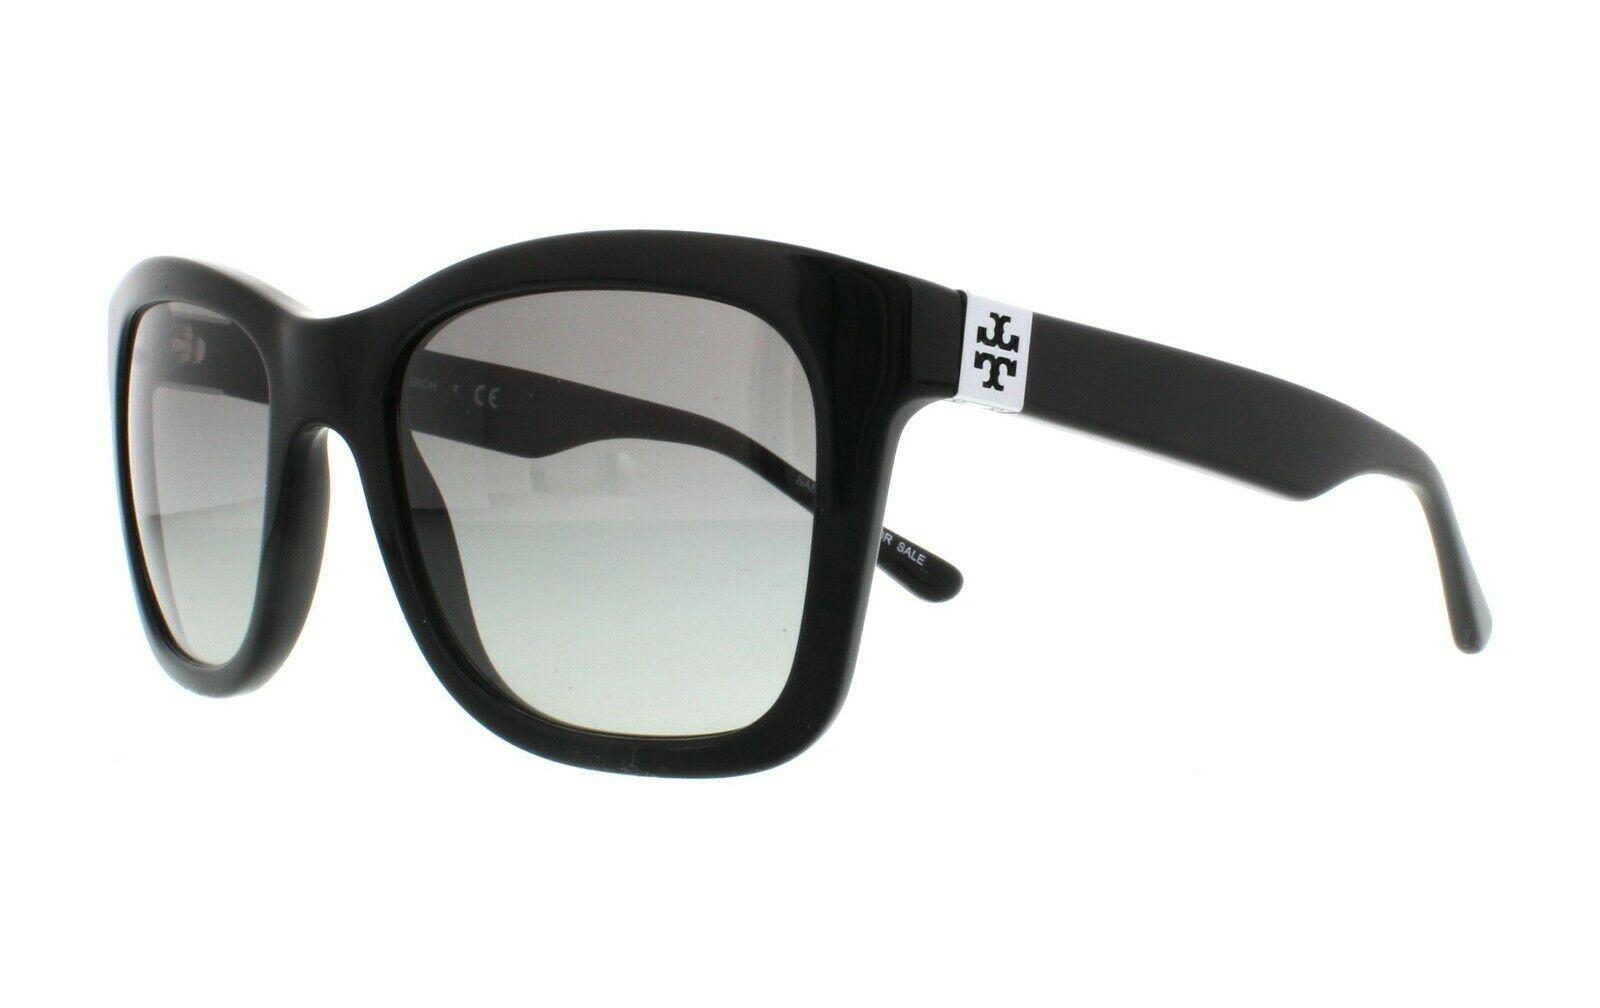 fbedd4898902 Tory Burch Sunglasses TY7118 170911 Black Frame / Black Lens Size 52-19-140  - $232.65